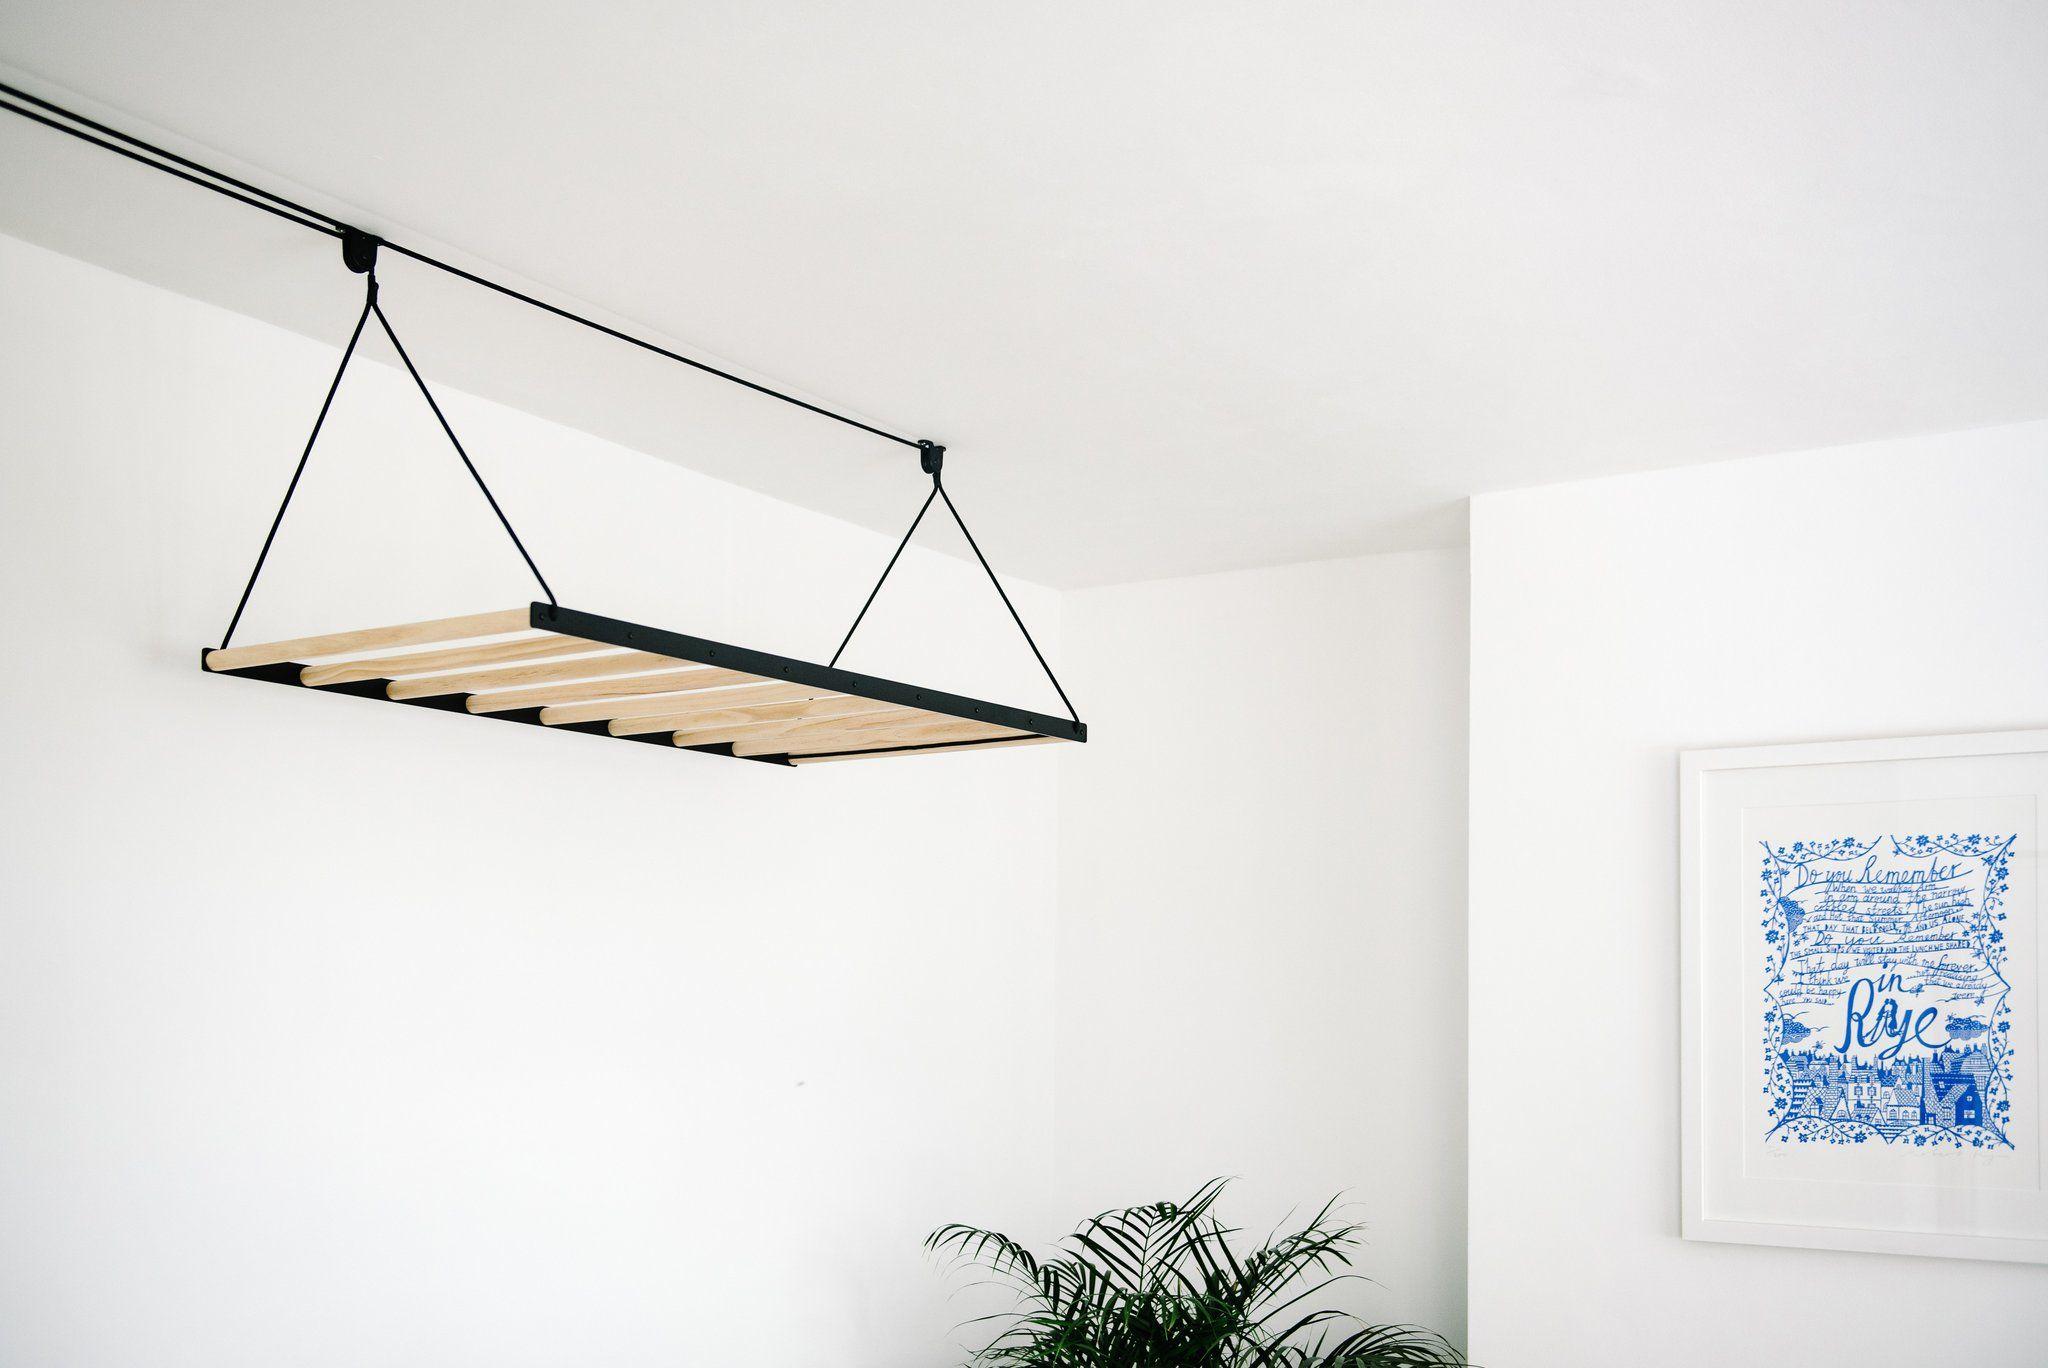 Hanging Drying Rack With Images Hanging Drying Rack Elegant